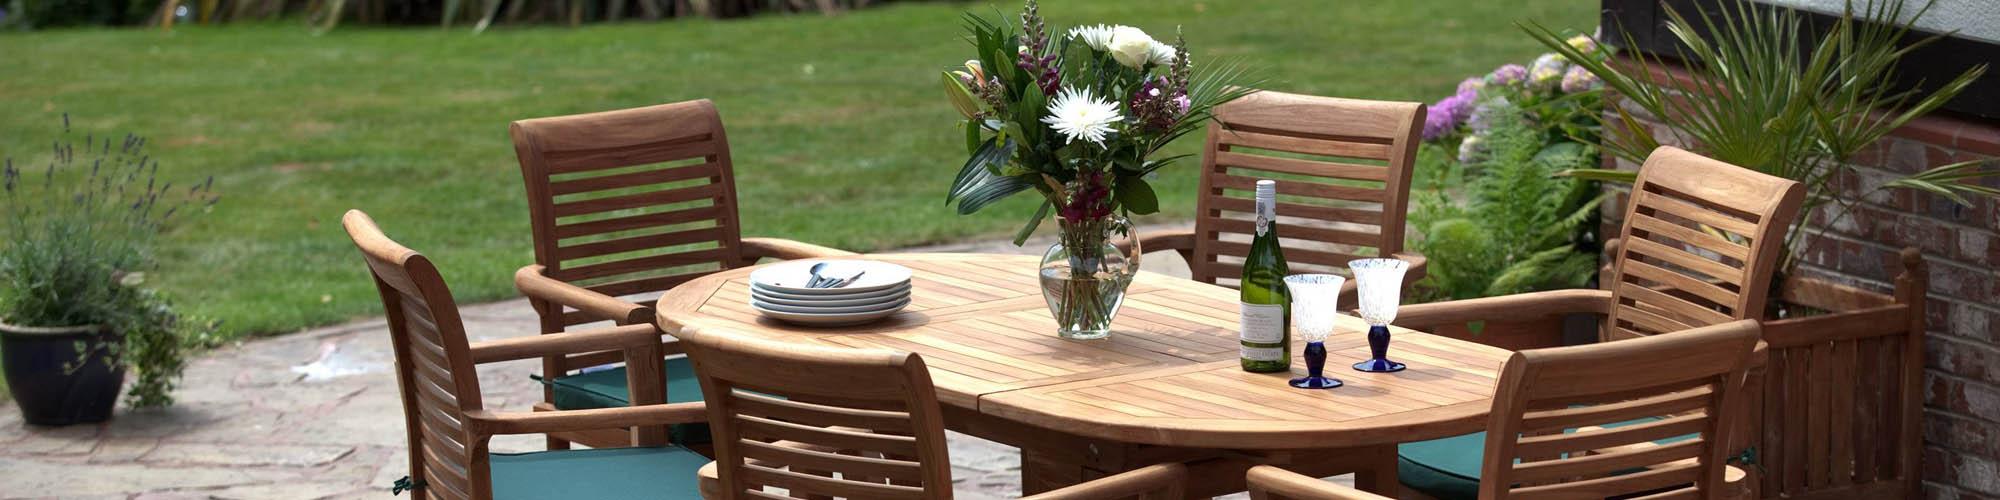 Emporio della natura emporio della natura for Arredo giardino vendita on line